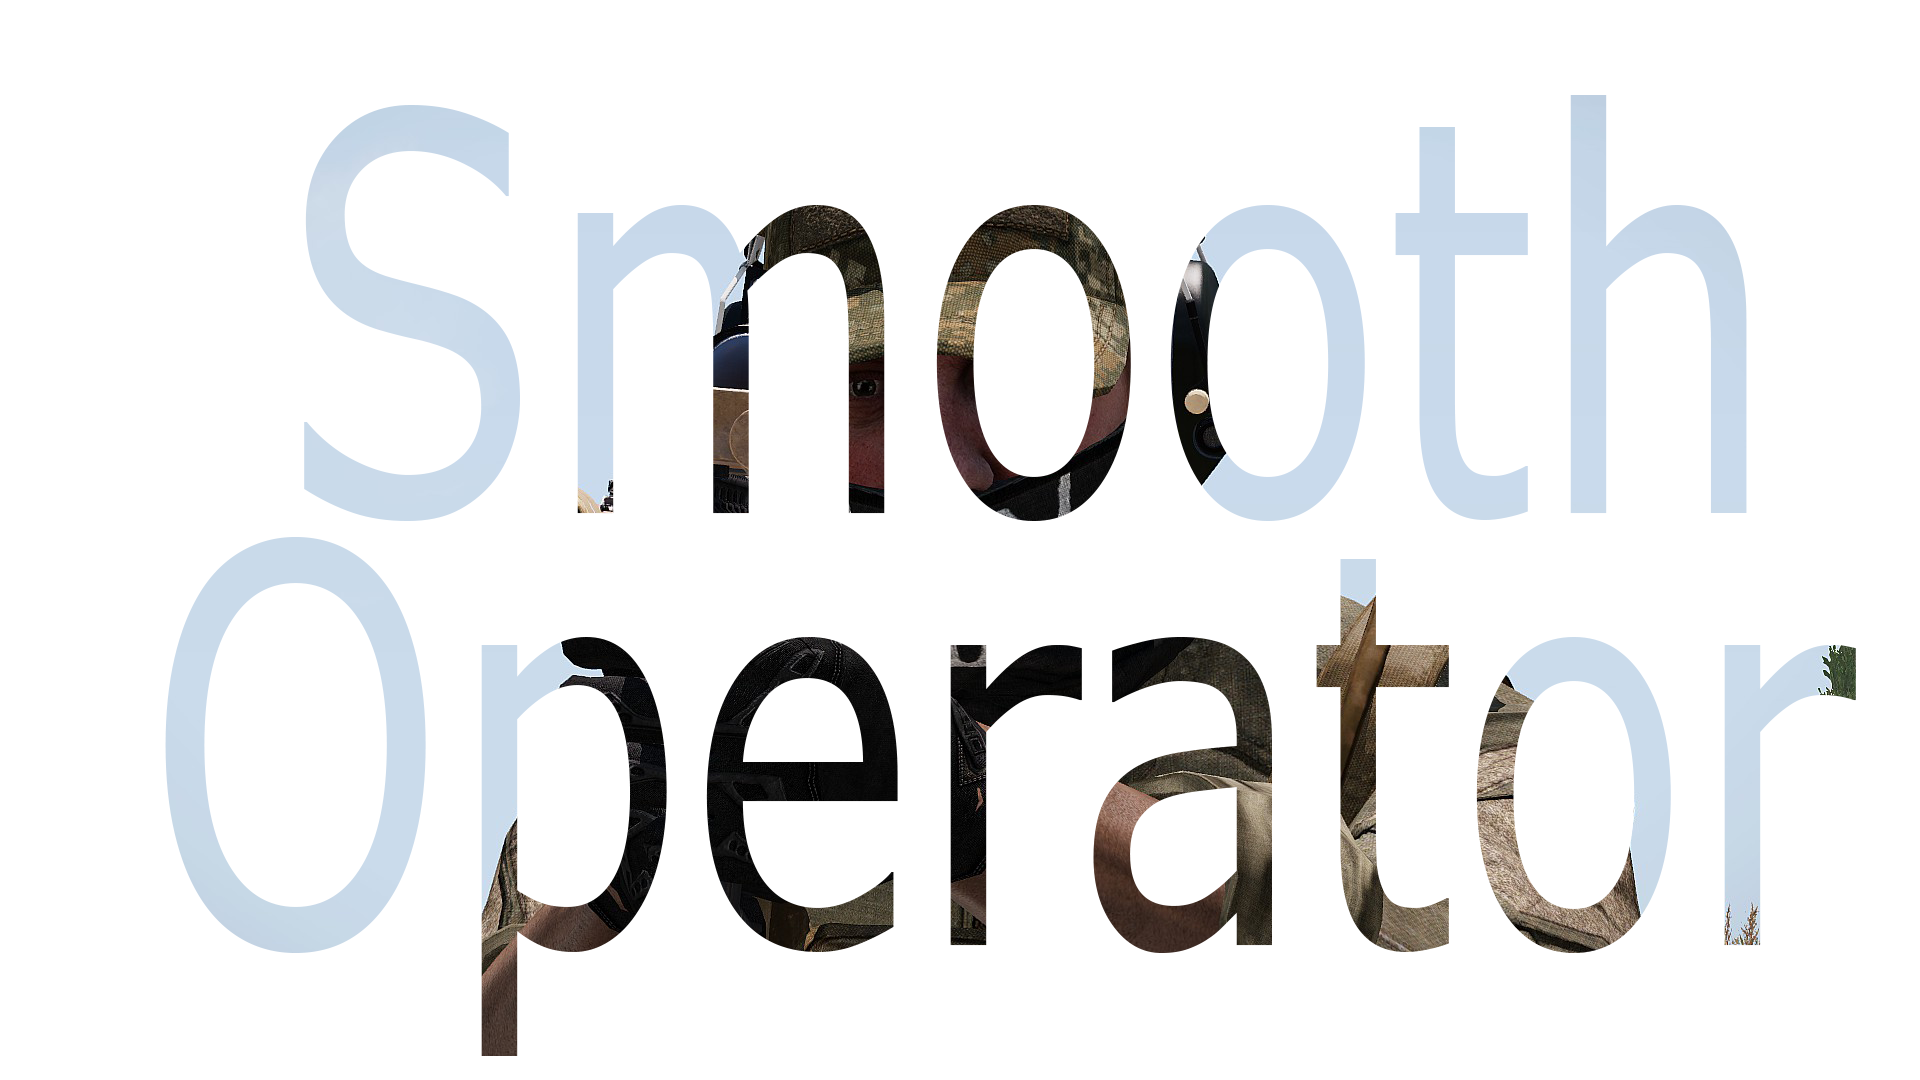 ?interpolation=lanczos-none&output-forma